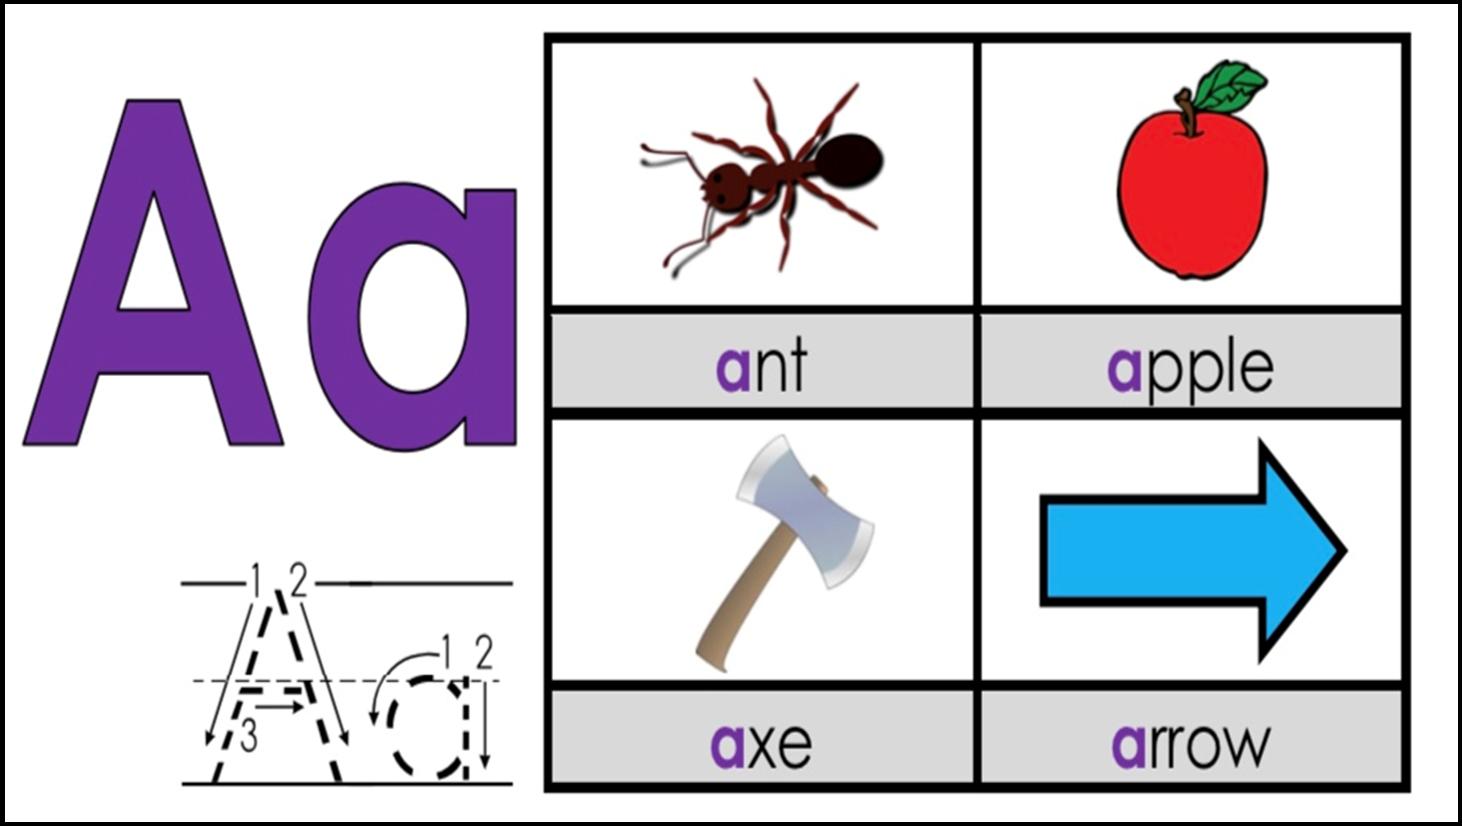 Alphabet Picture الحروف الانجليزية الصف الاول مادة اللغة الانجليزية - بوربوينت